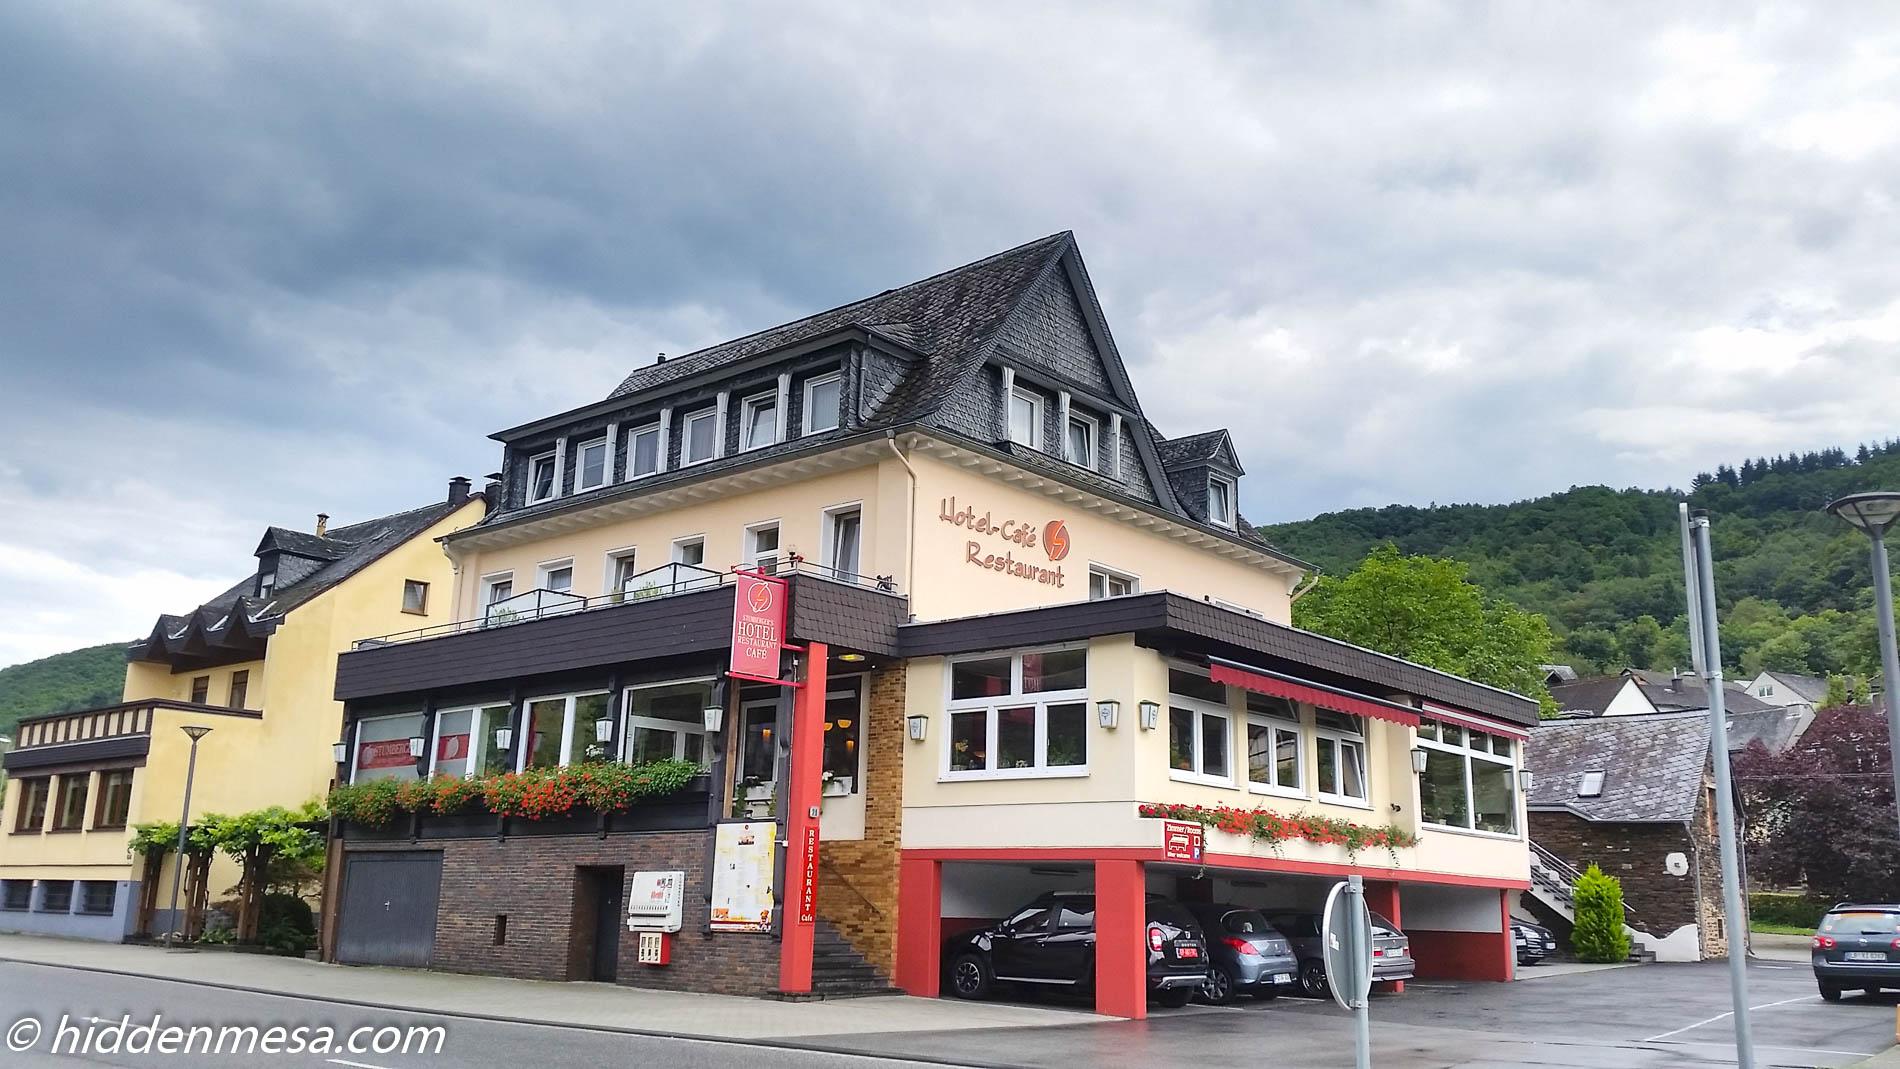 Stumberger's Hotel in Cochem, Germany